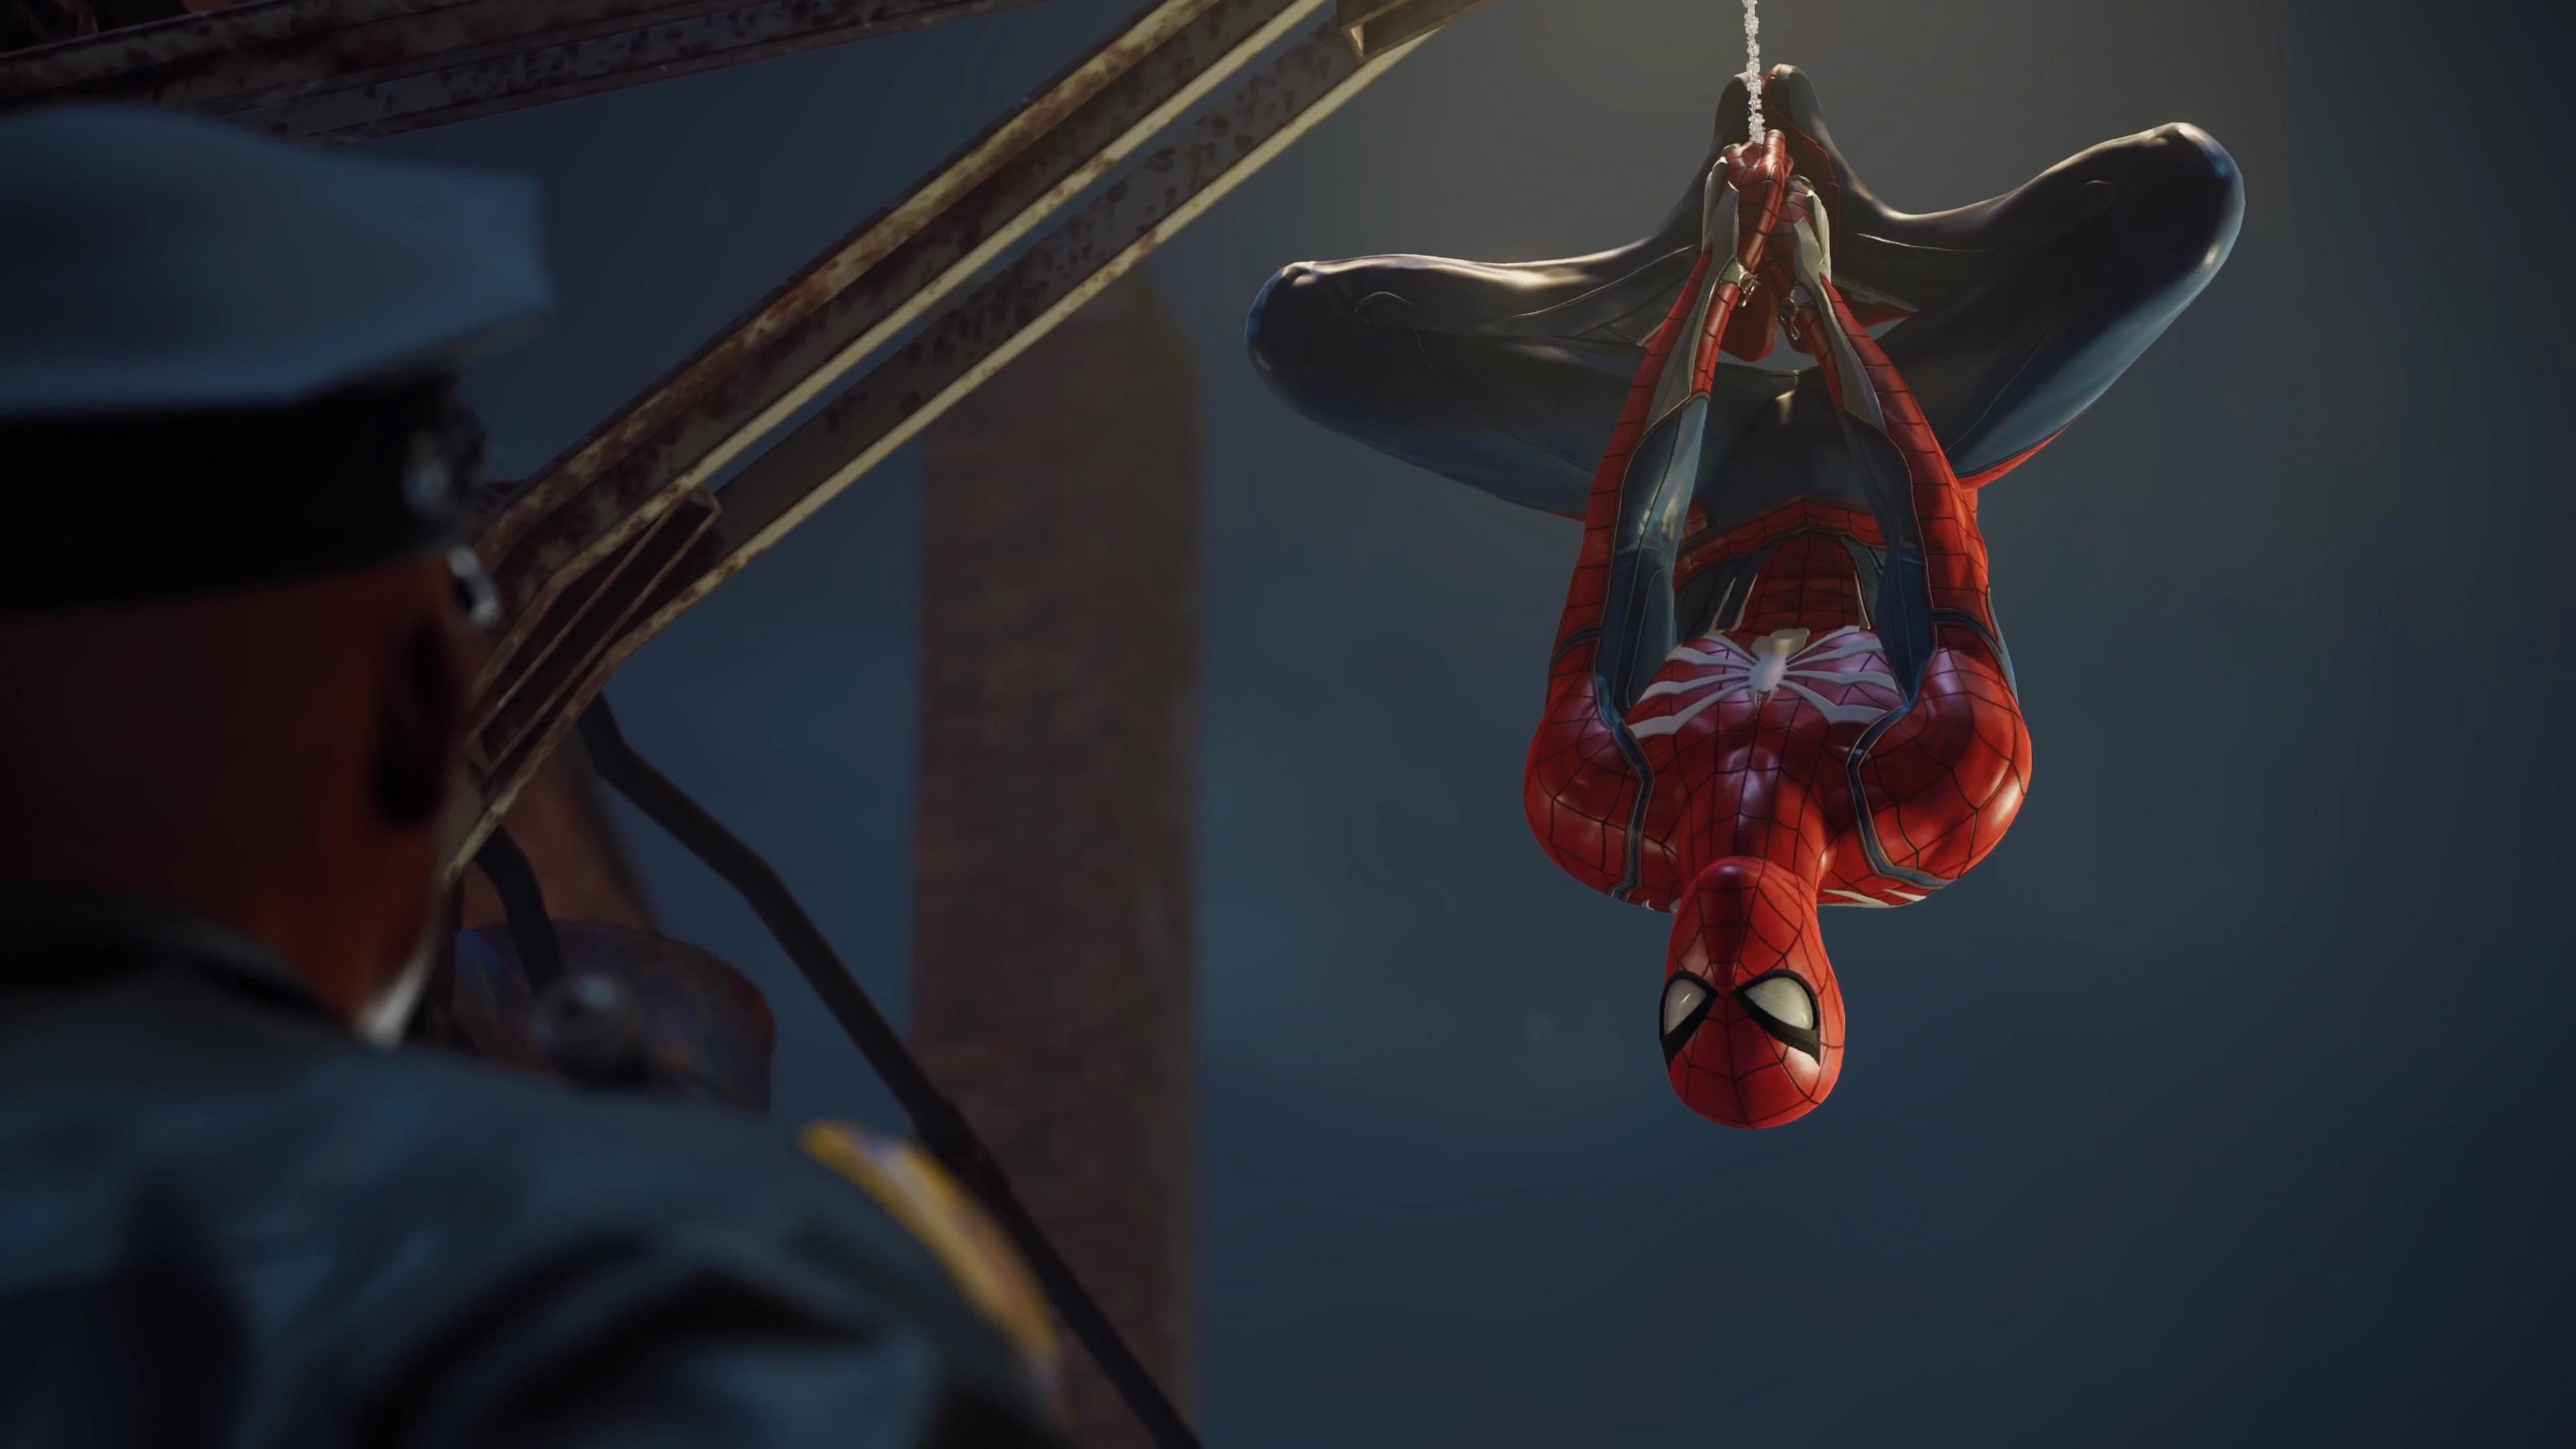 Wallpaper 4k Spider Man Ps4 2018 4k 2018 Man Ps4 Spider Titanfall